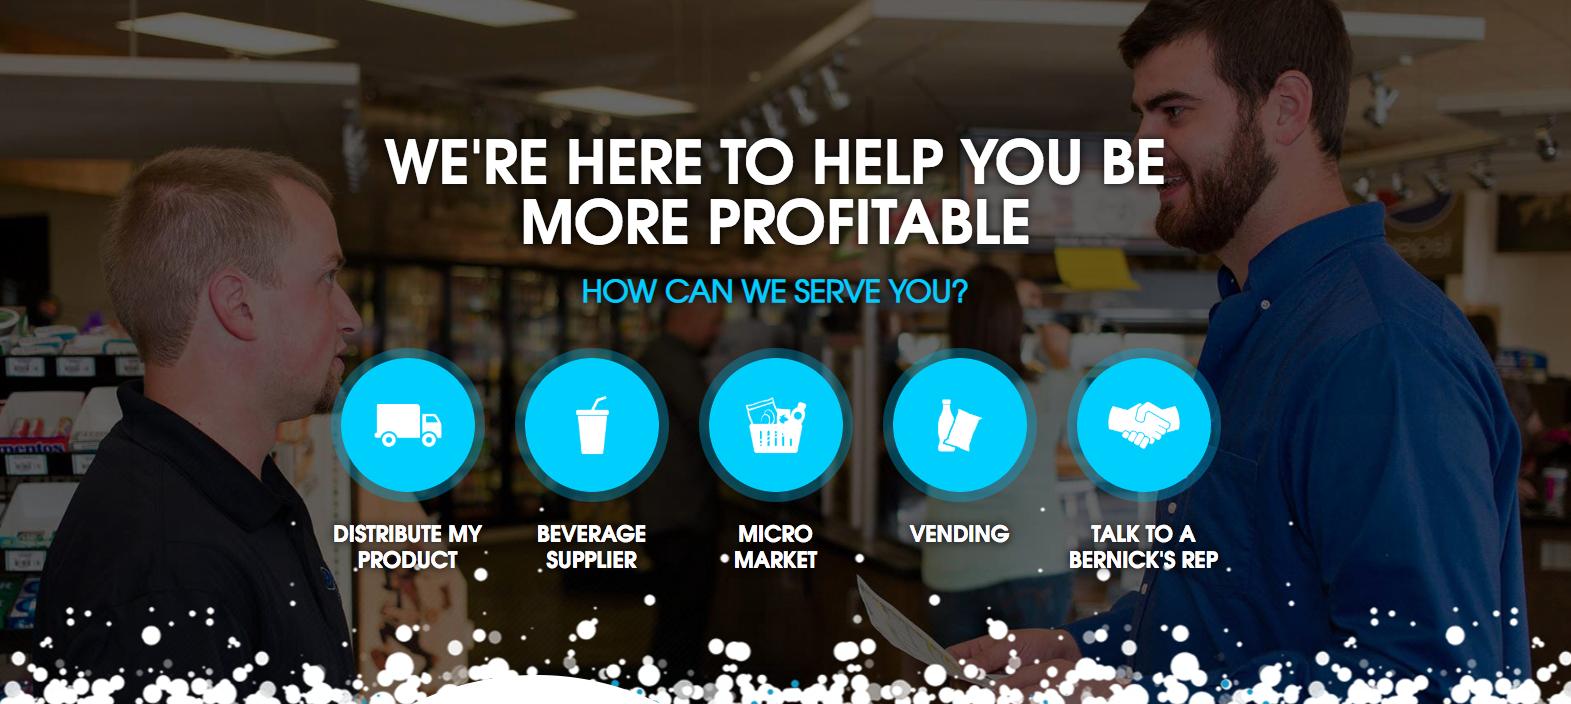 Bernick's Website Homepage